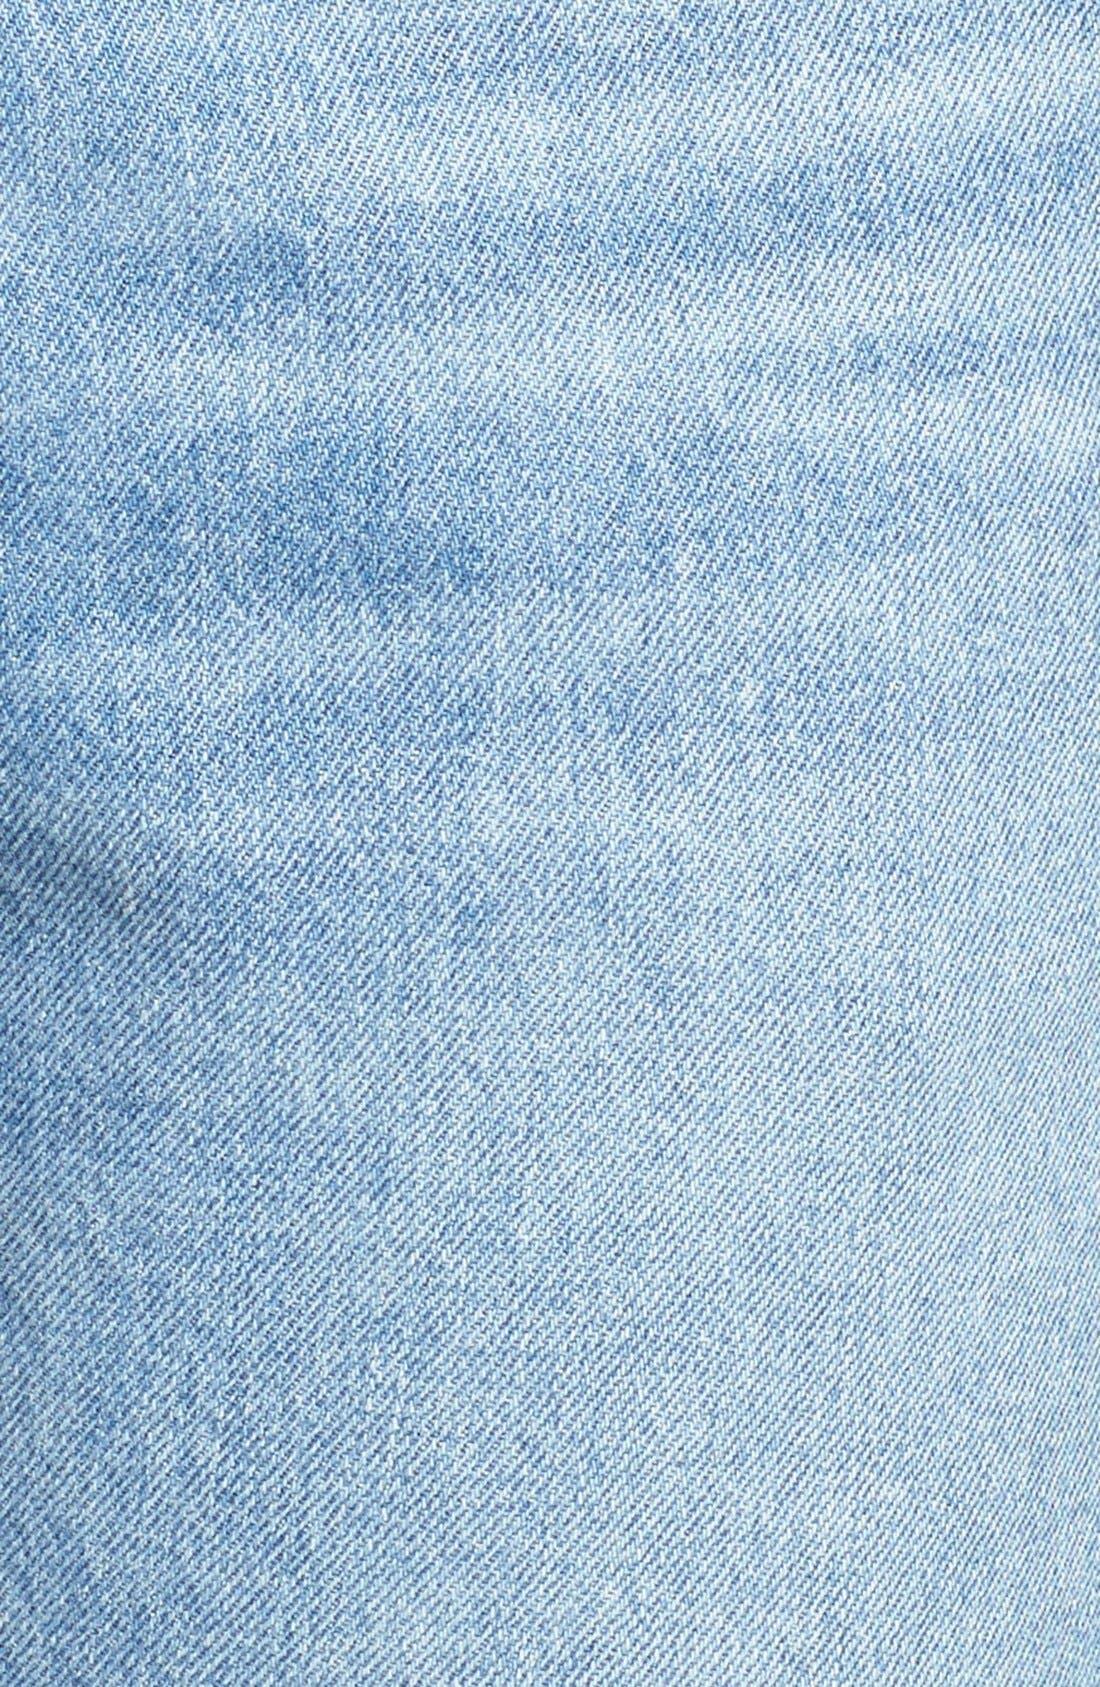 Alternate Image 6  - AGOLDE Jamie High Rise Classic Jeans (Women)